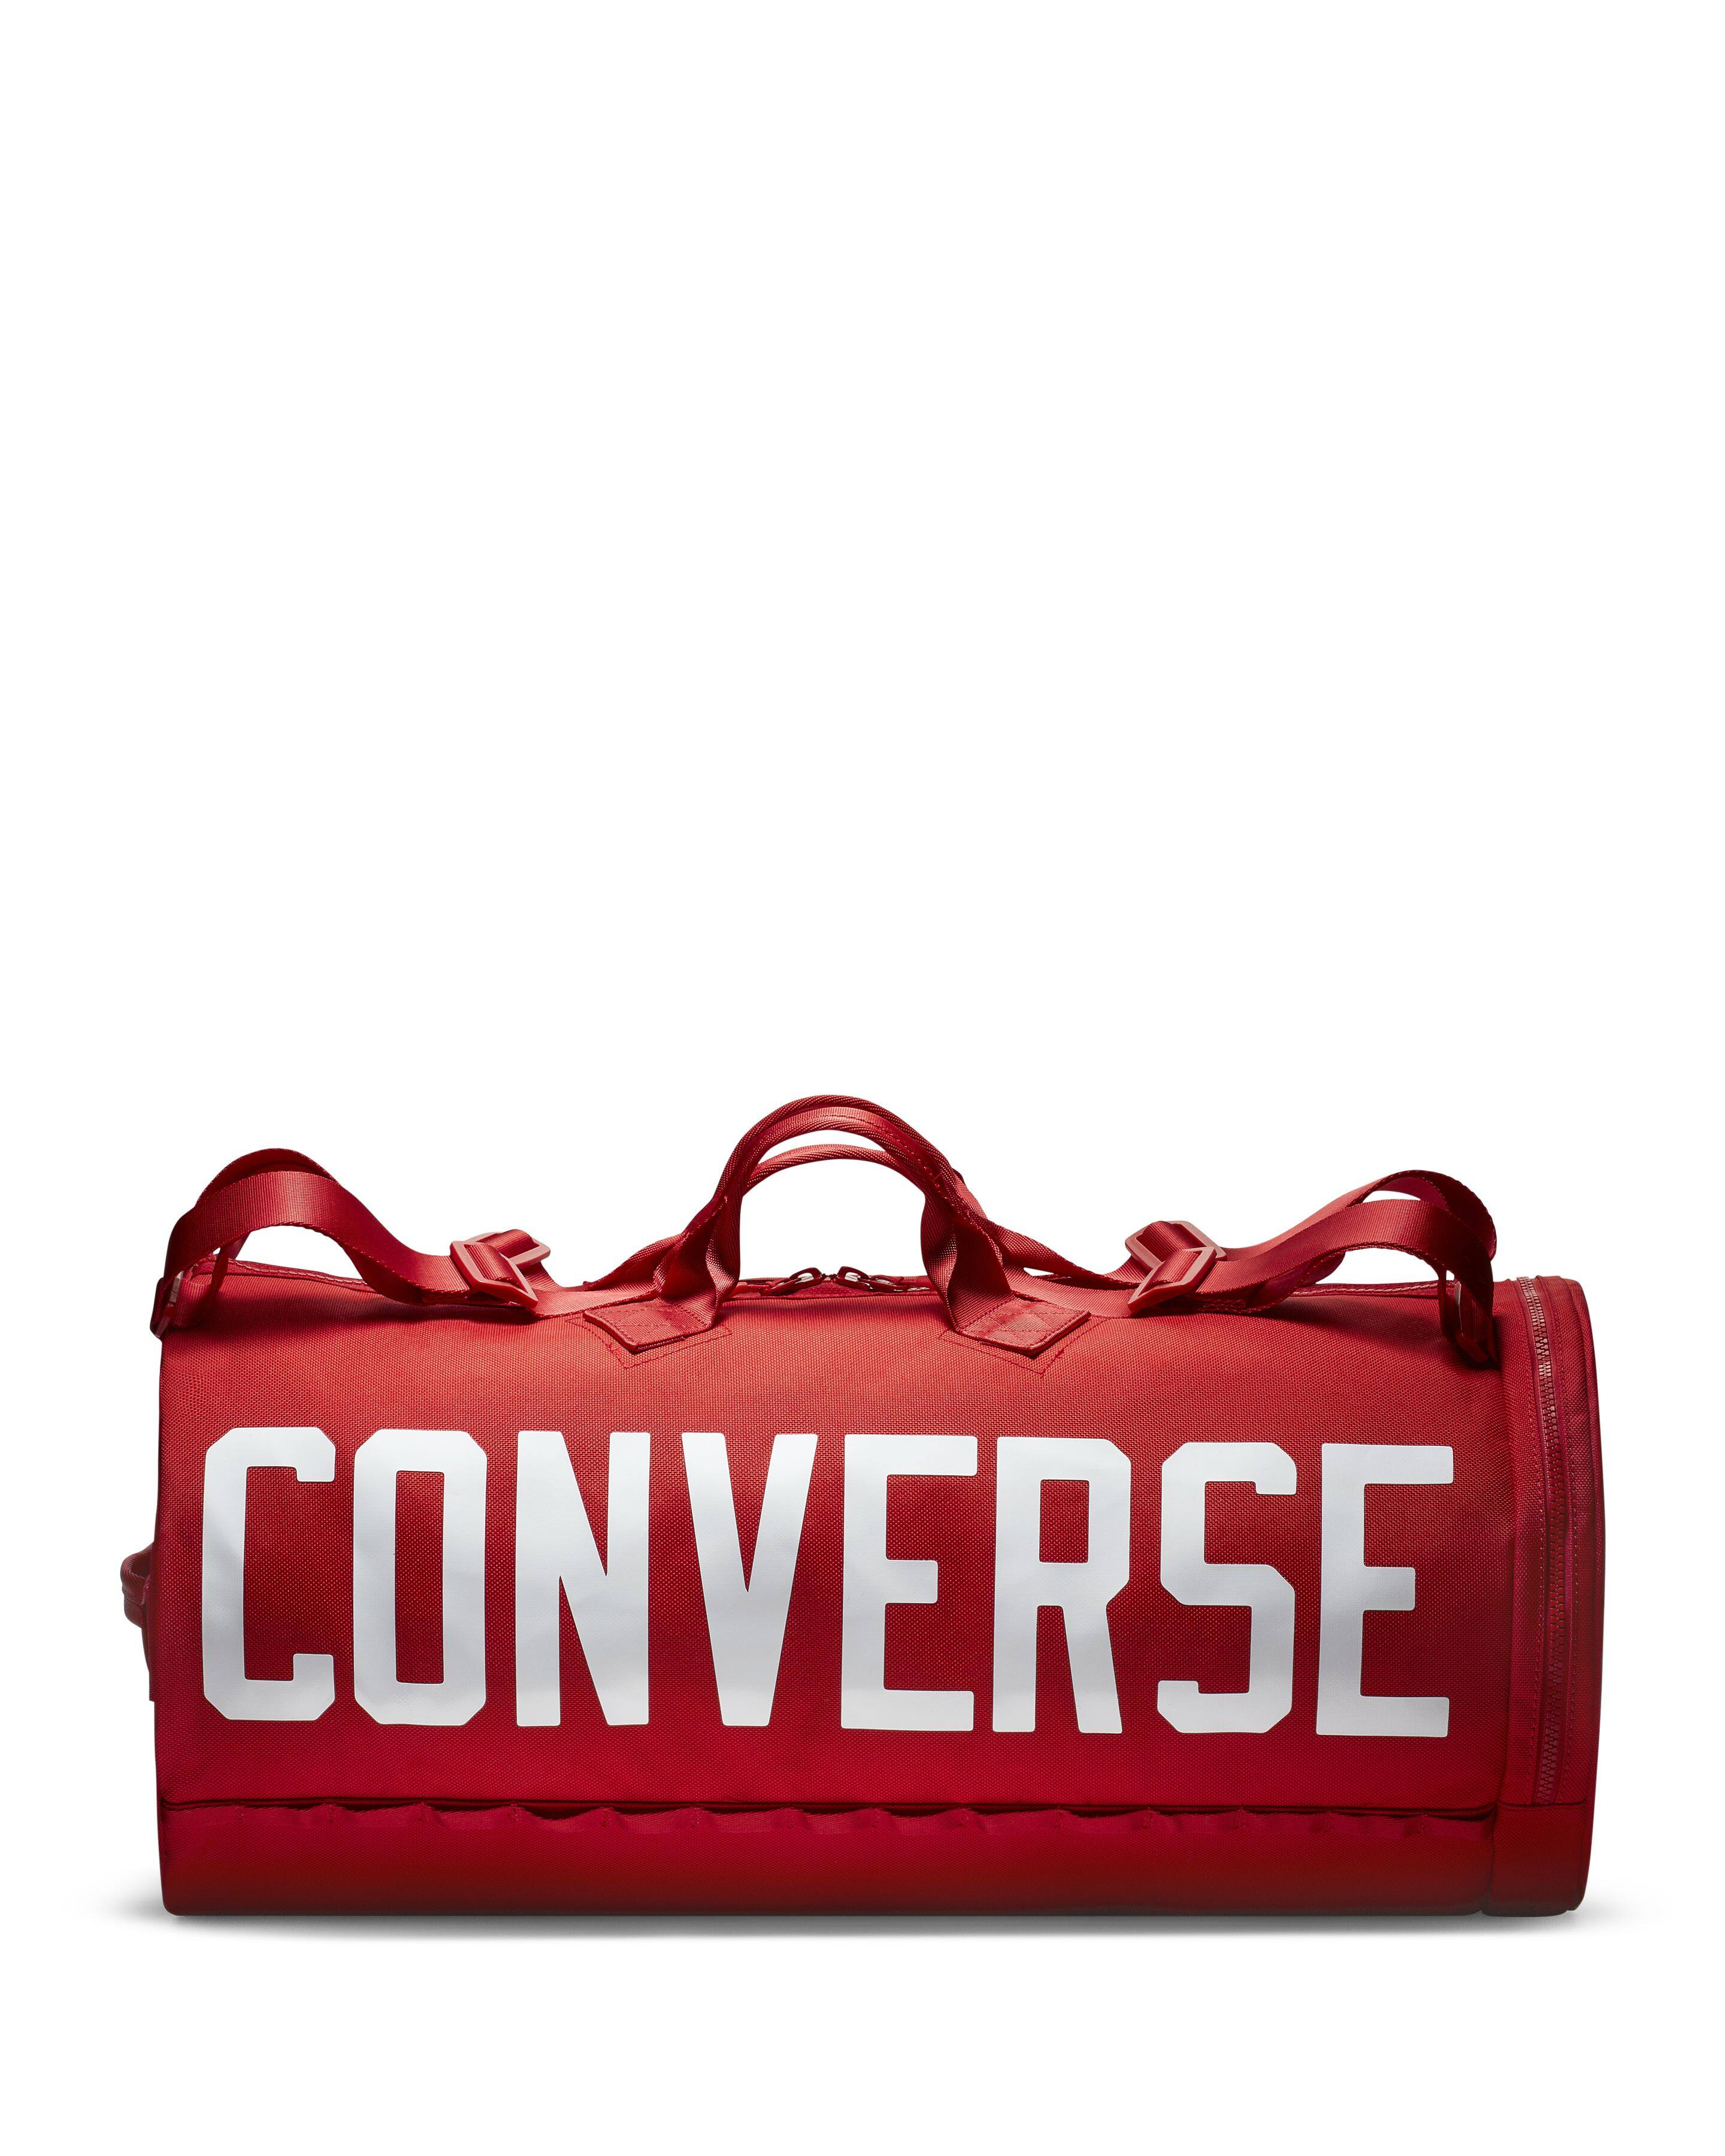 42f340f493 Unisex Duffel Bag Converse CORDURA® 3-Way  68 - Slickdeals.net